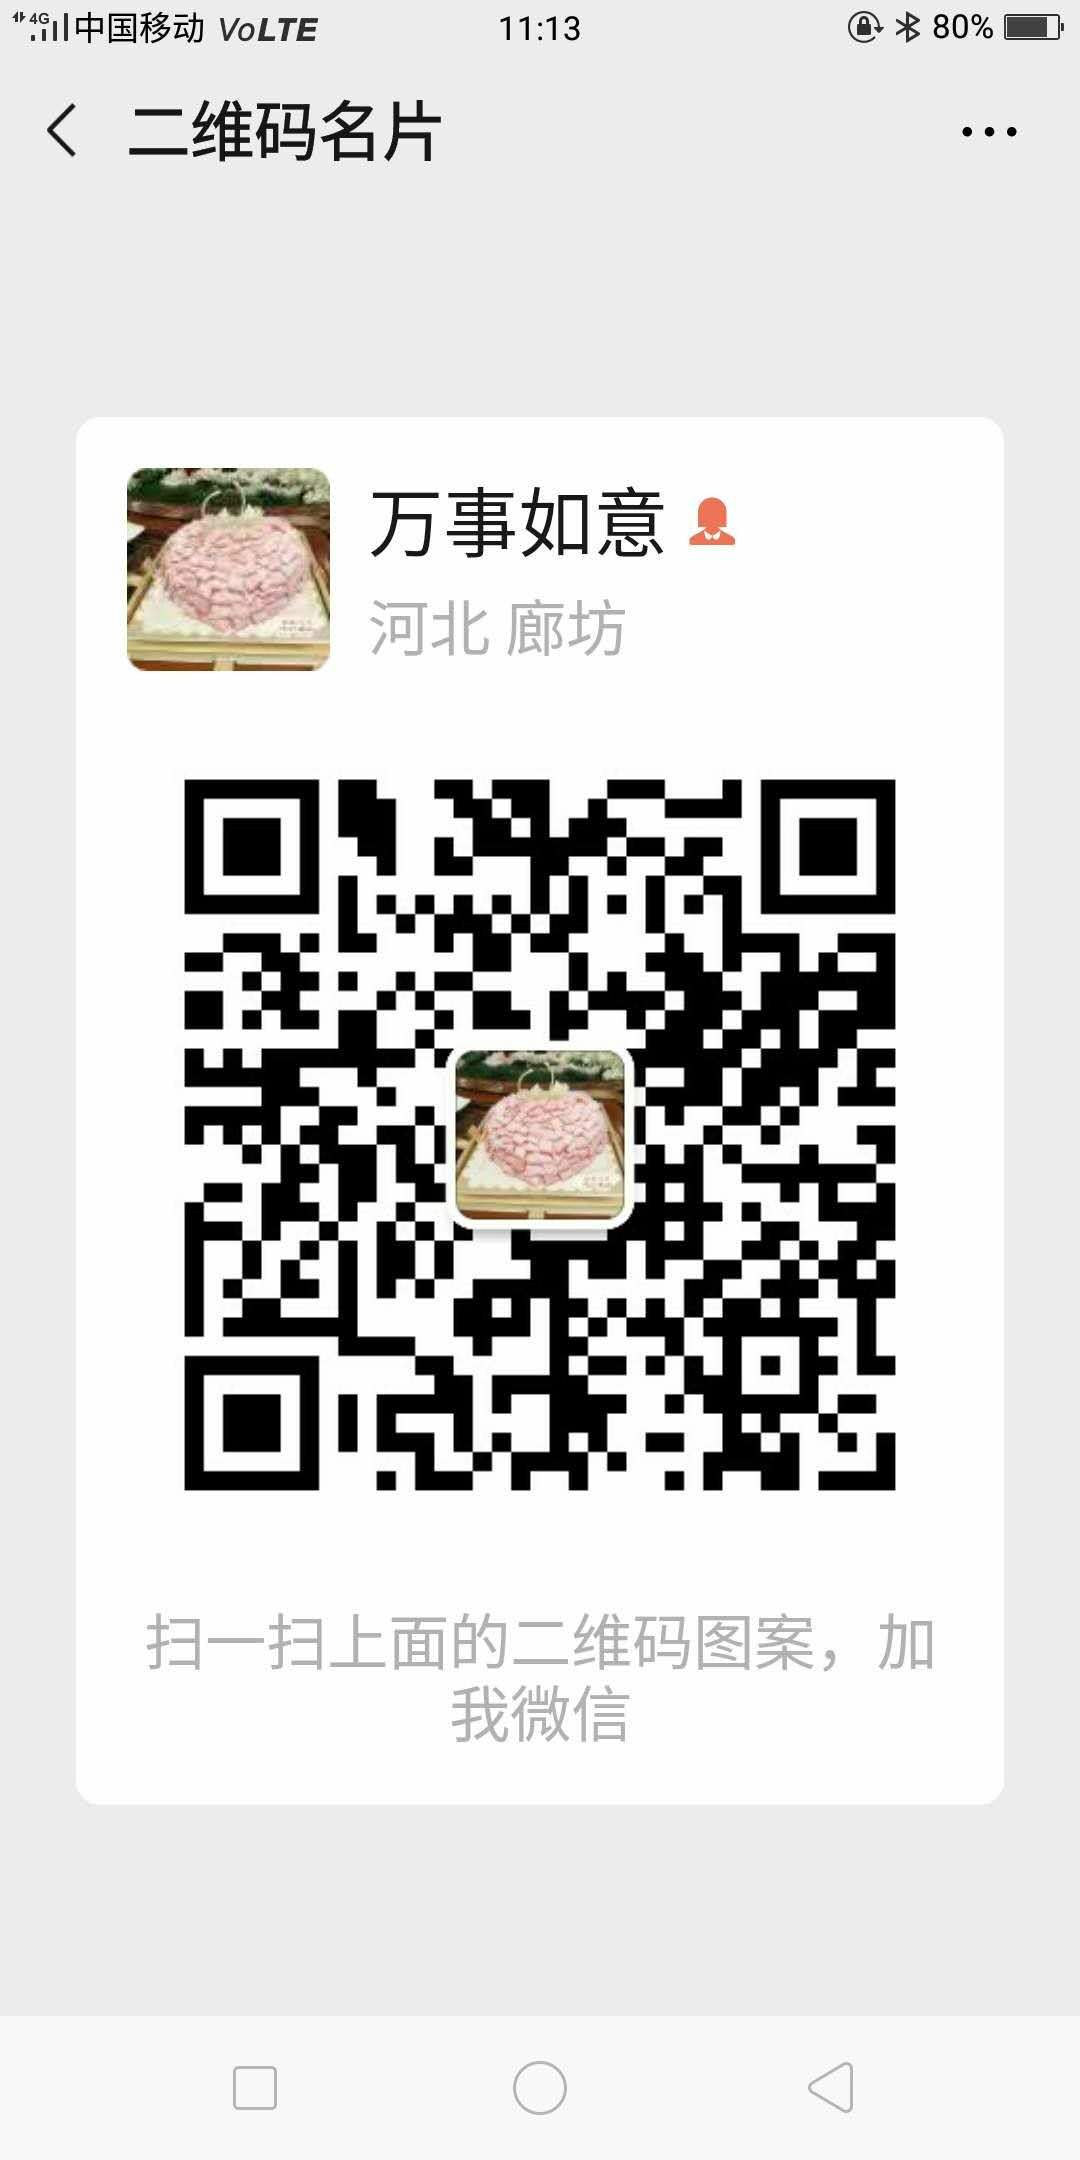 .\..\..\..\..\..\..\AppData\Local\Temp\WeChat Files\fe2d463b91efcbb6a006796cd7bd46af_.jpg